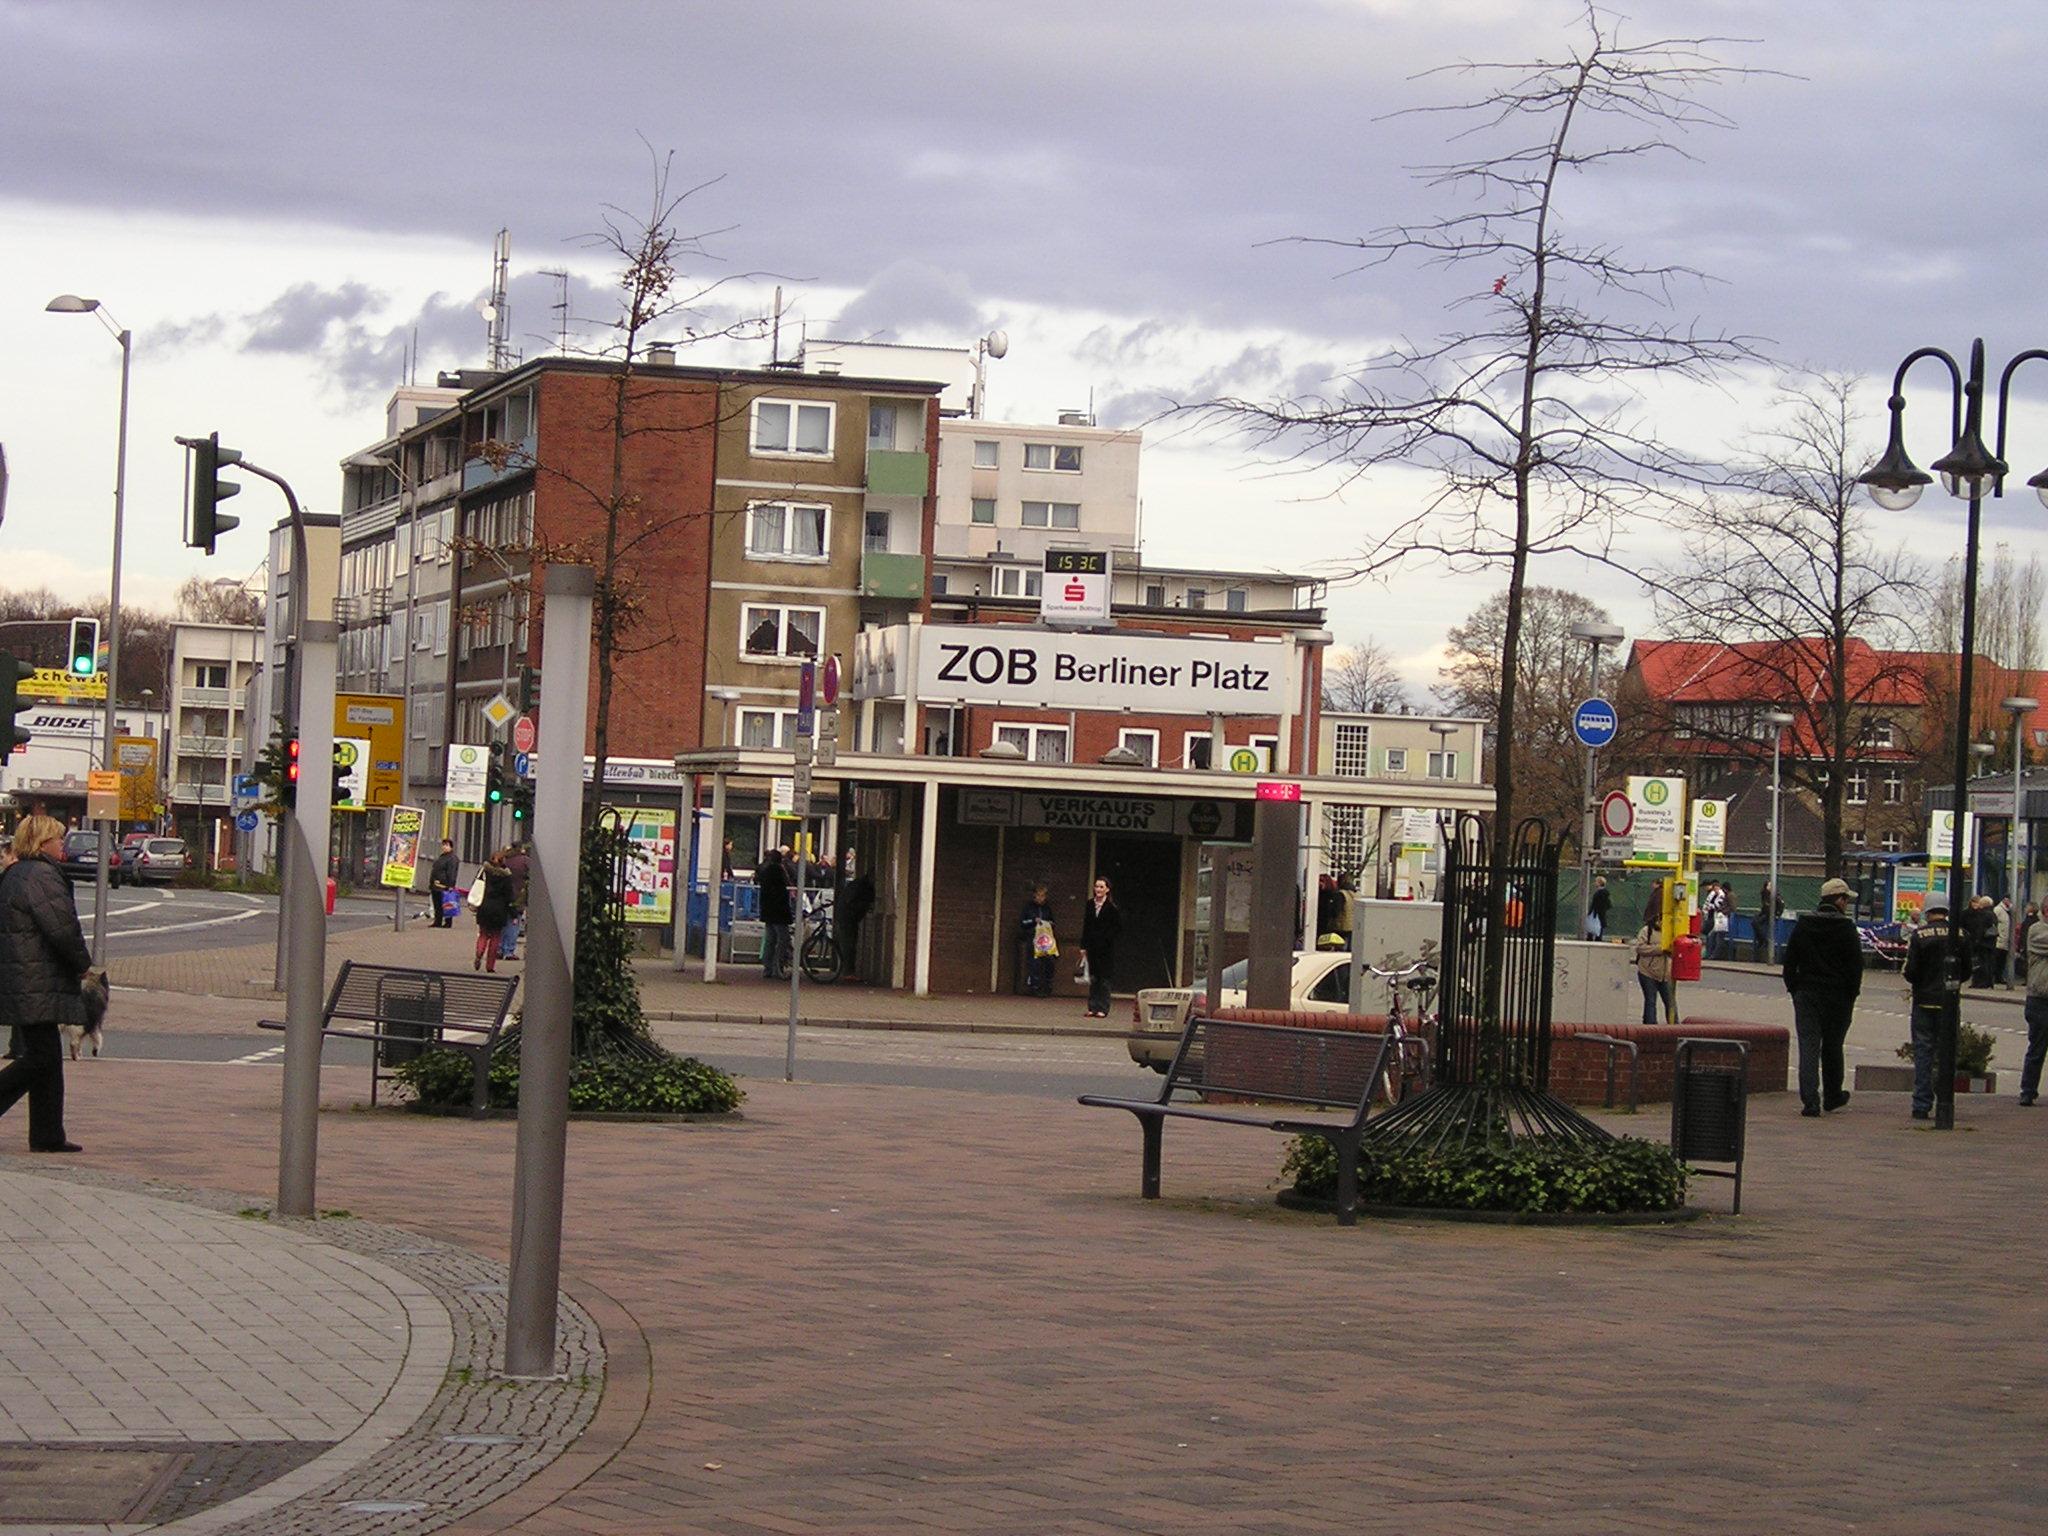 datei busbahnhof zob berliner platz bottrop jpg wikipedia. Black Bedroom Furniture Sets. Home Design Ideas